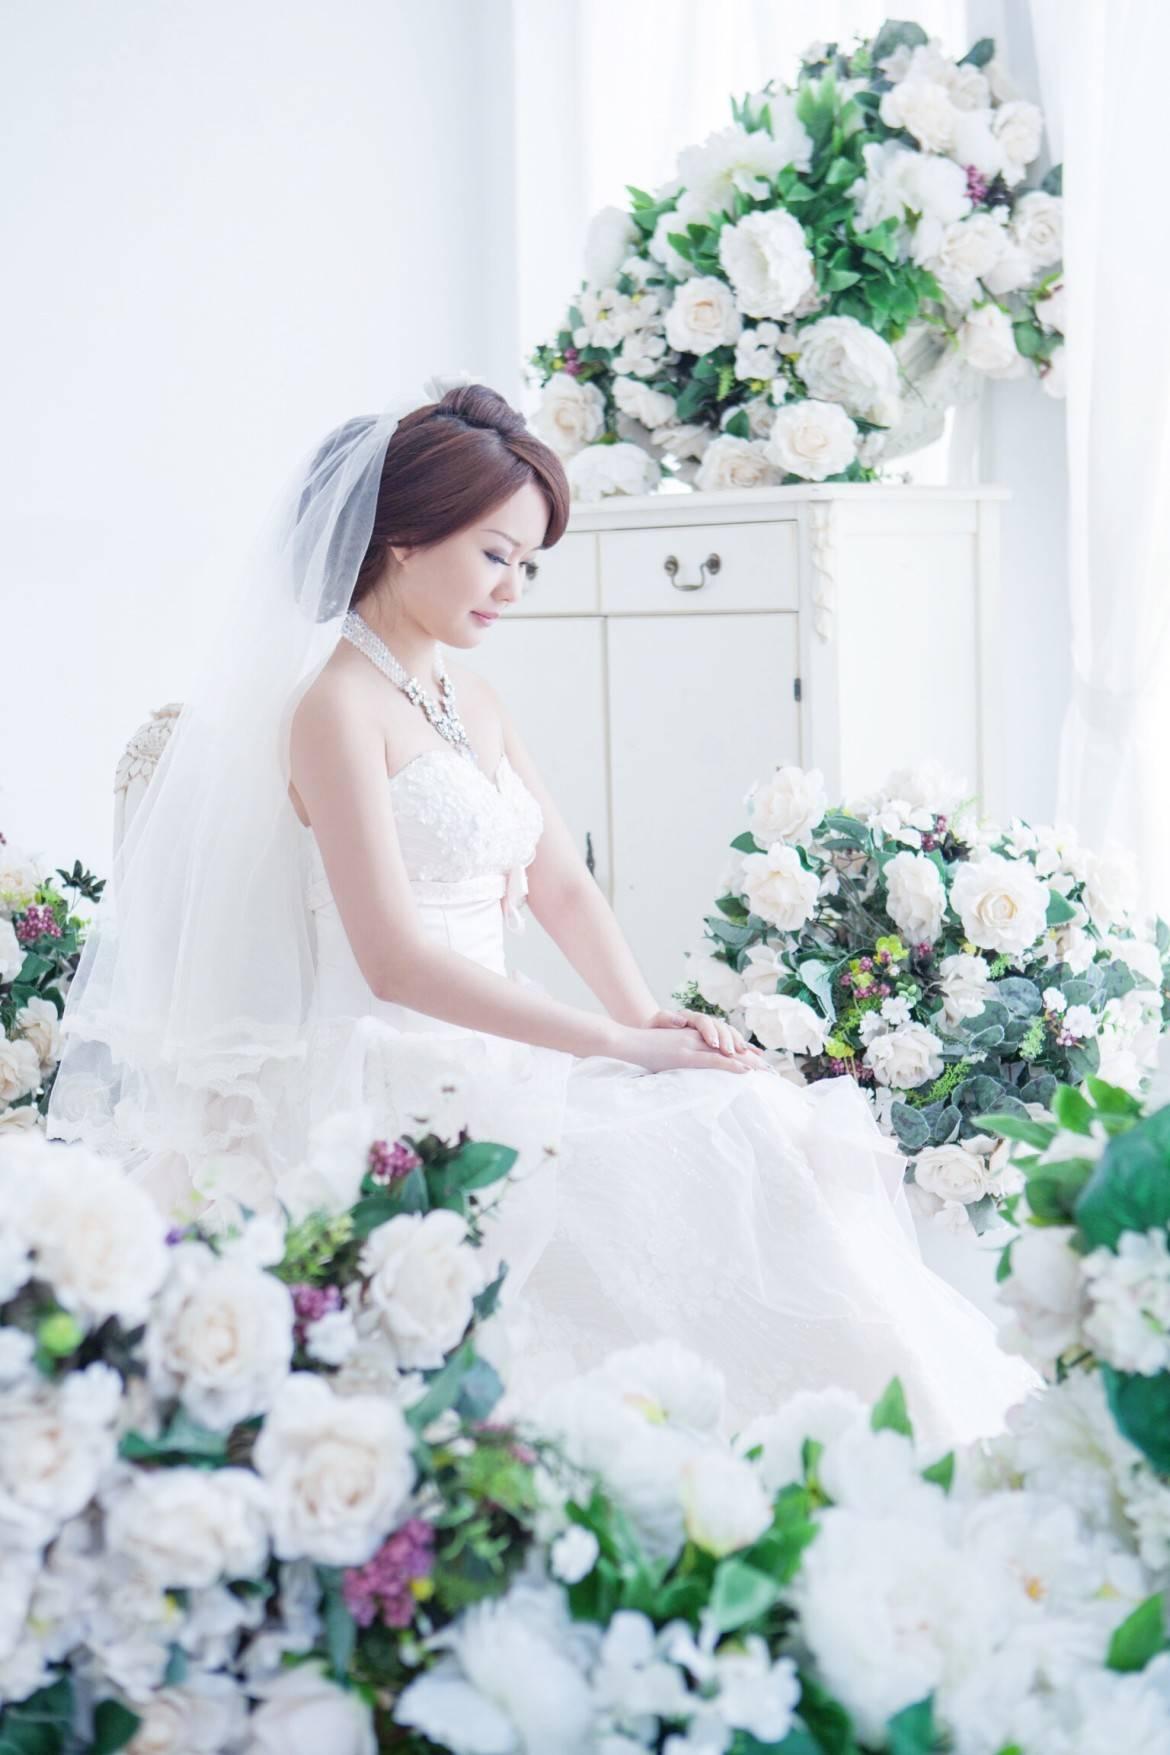 Bluebay Wedding: Pre-Wedding Photoshoot in Taiwan - Aldora Muses